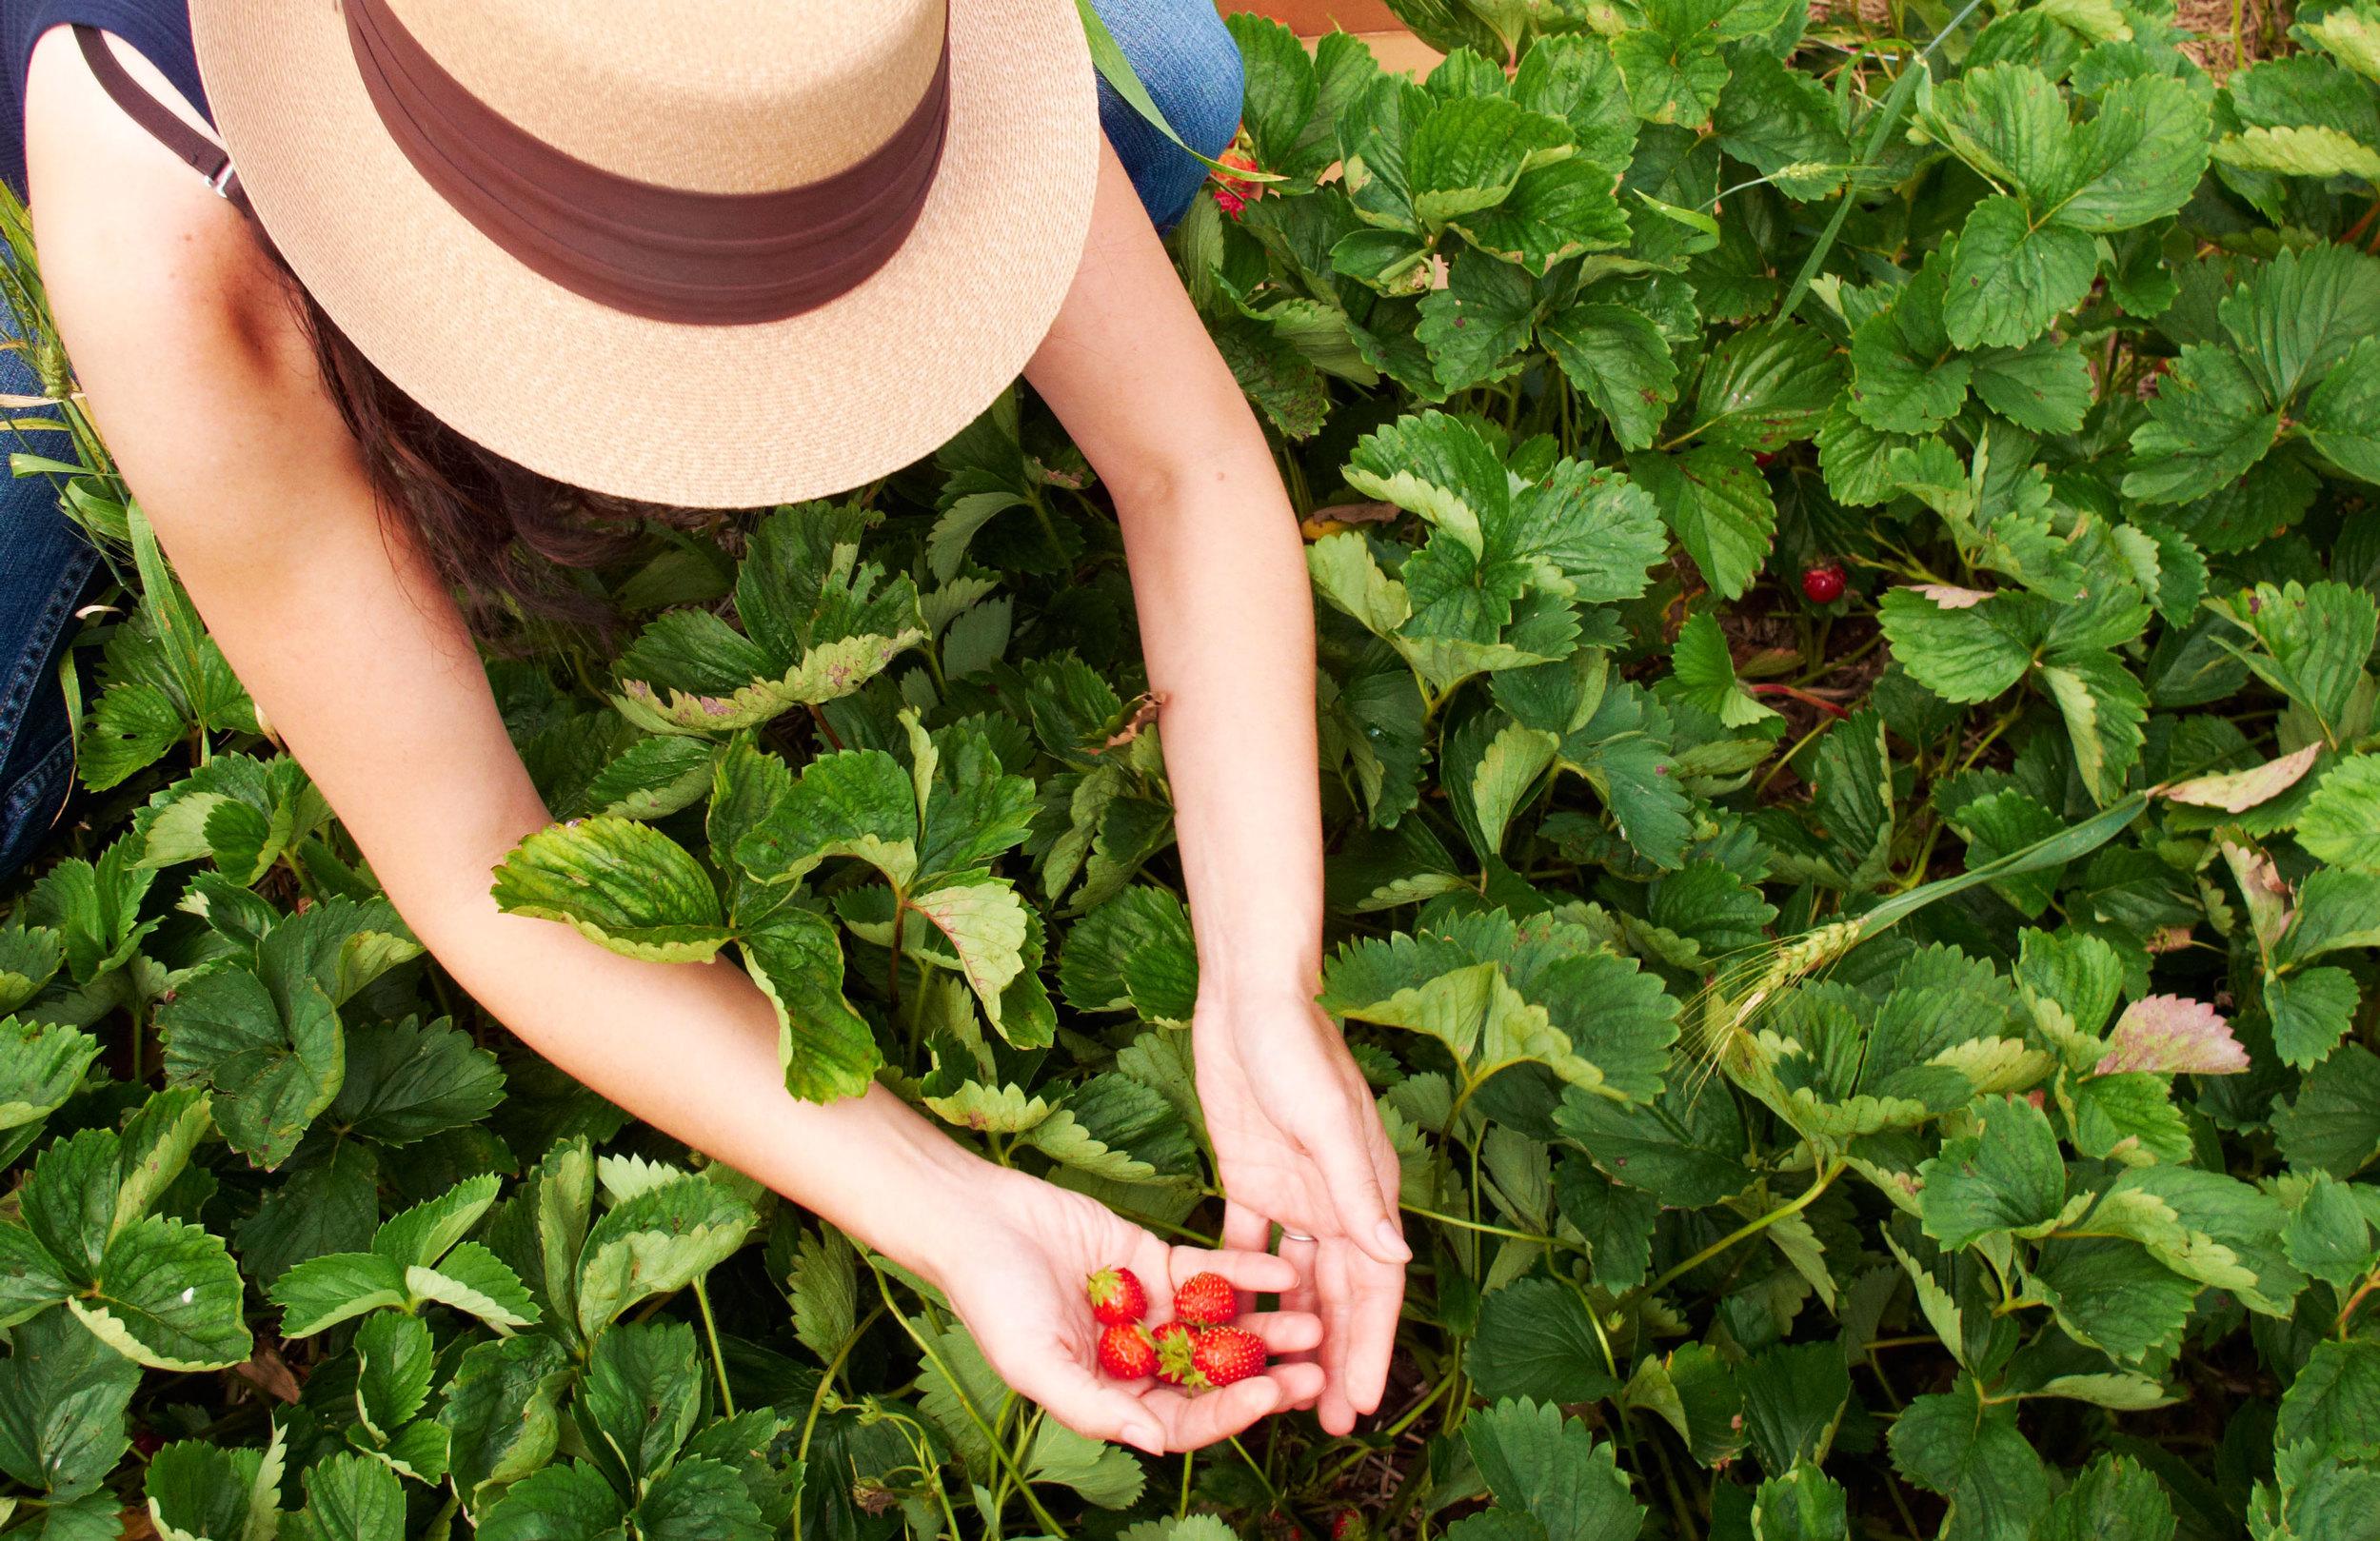 Strawberry season.